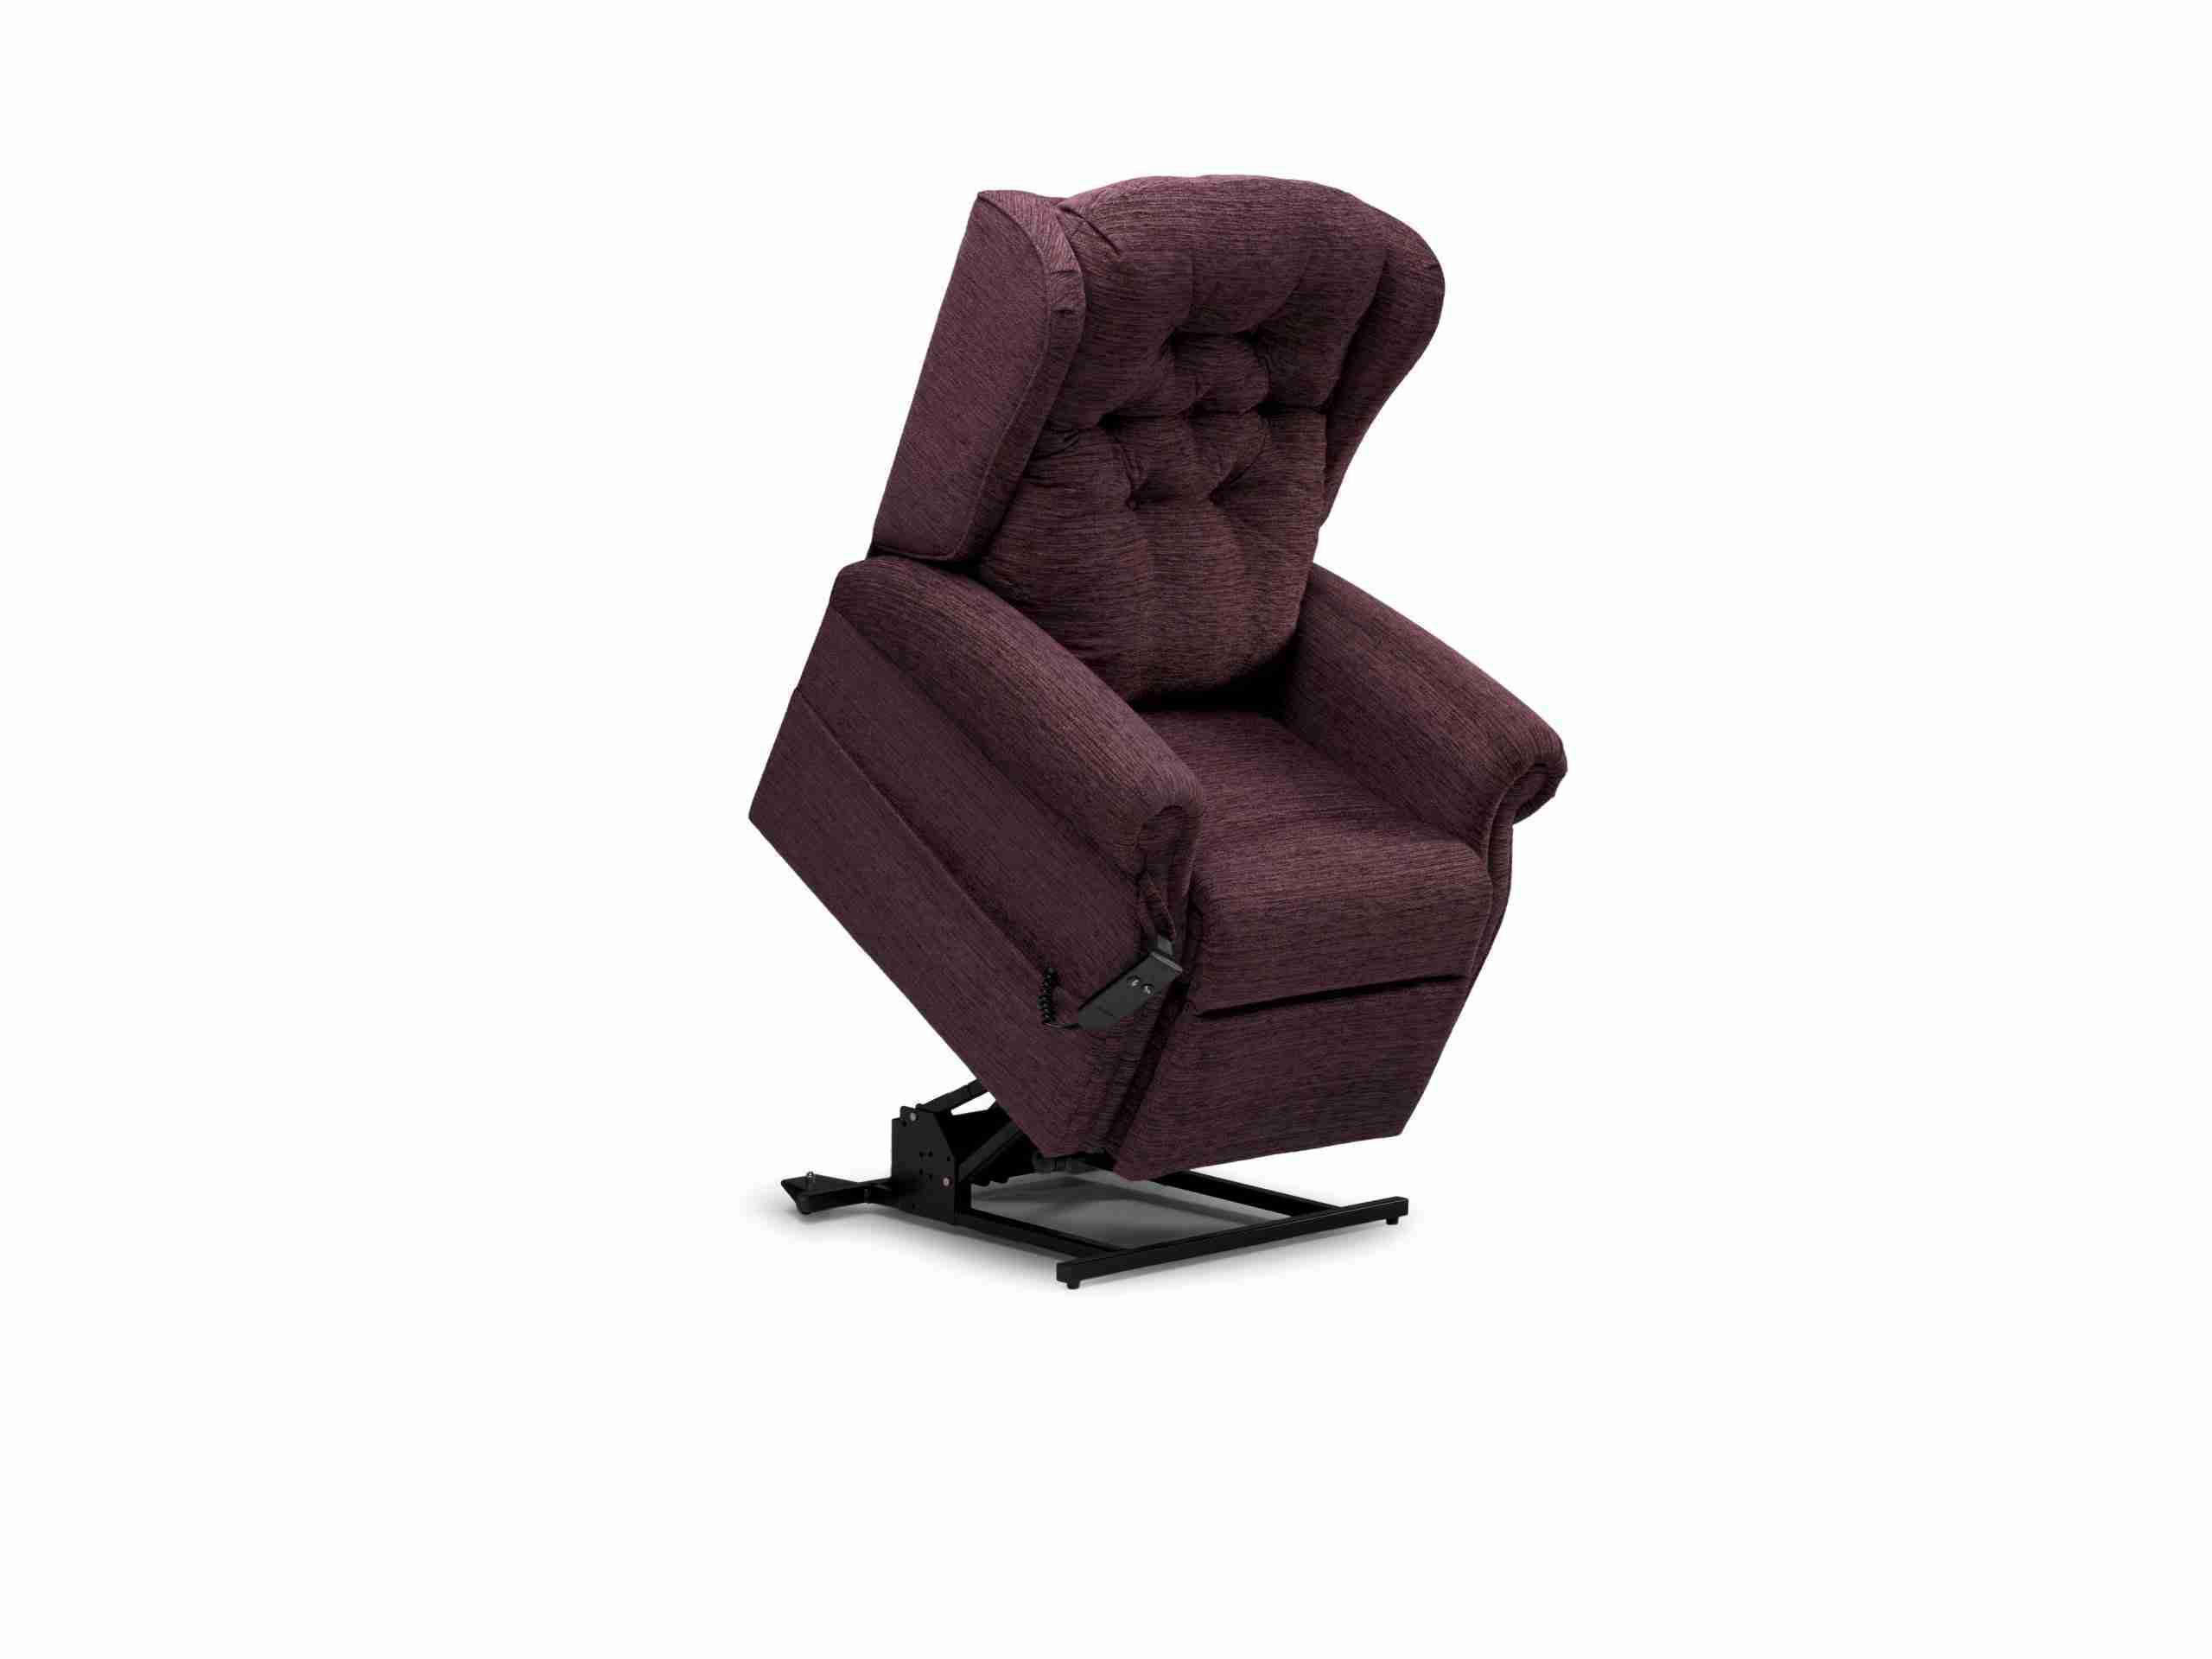 Marbella Chair Repose05